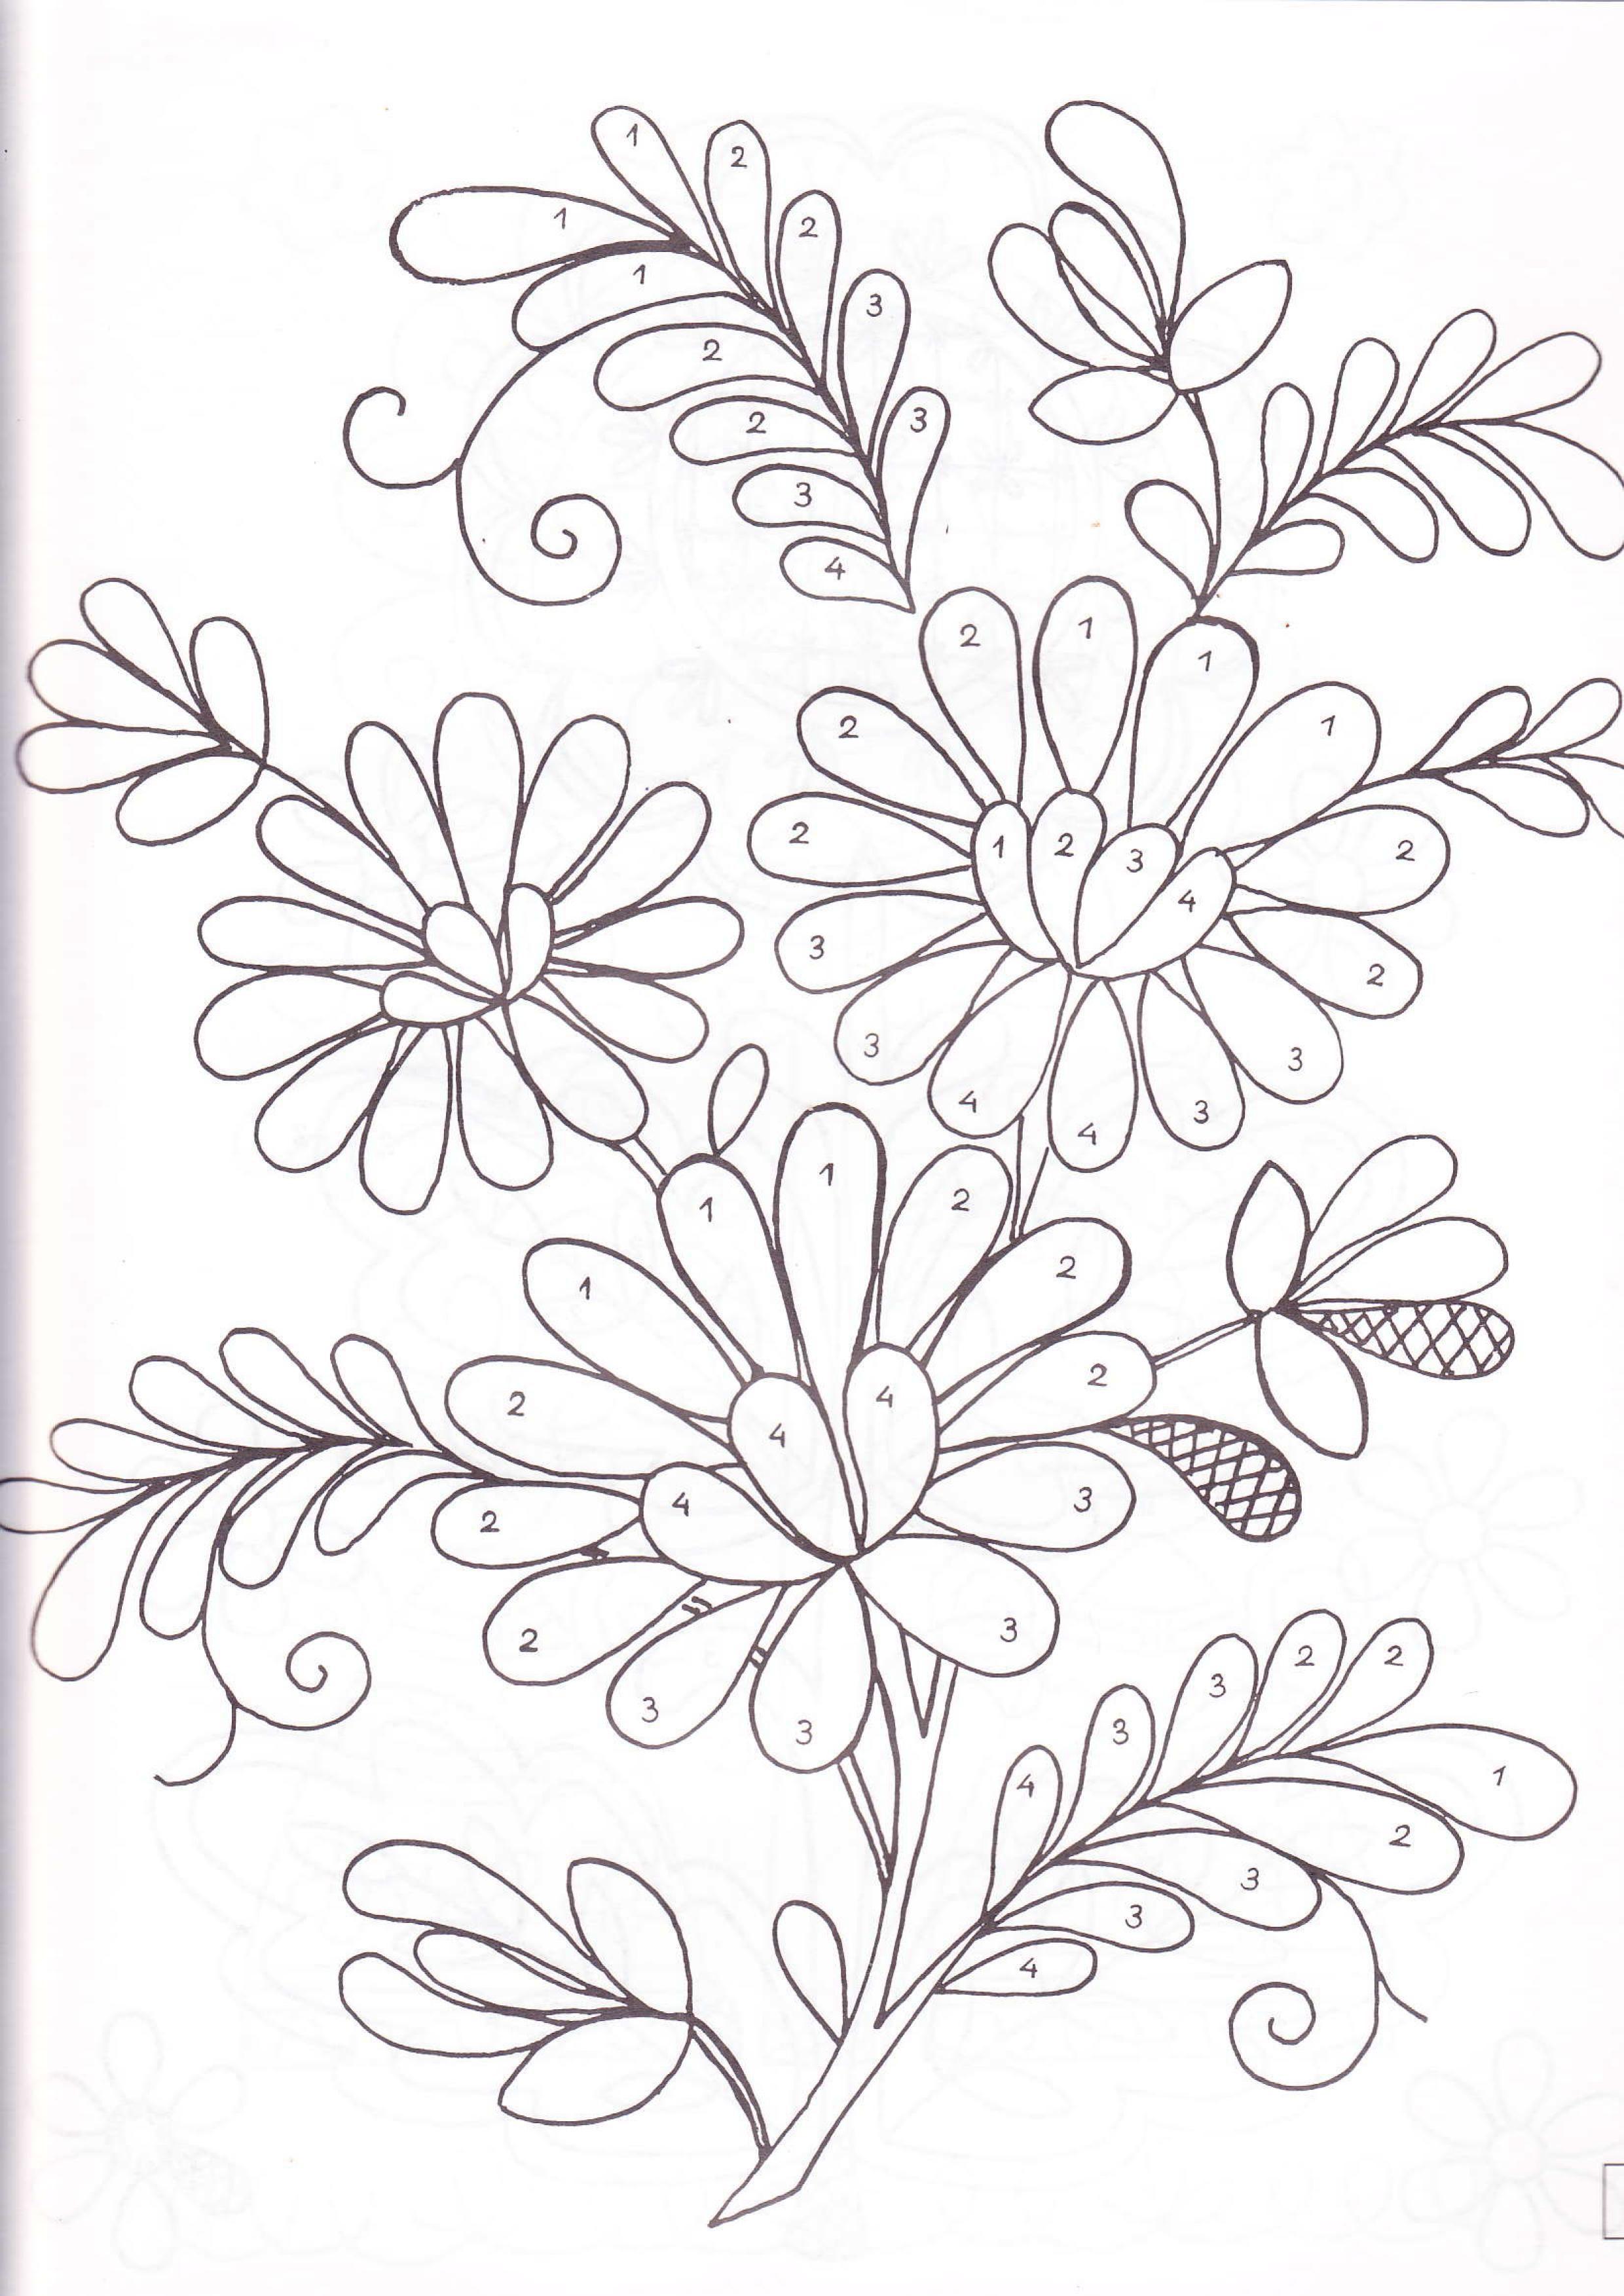 Pin by Neha Saney on colouring | Pinterest | Bordado, Bordado ...